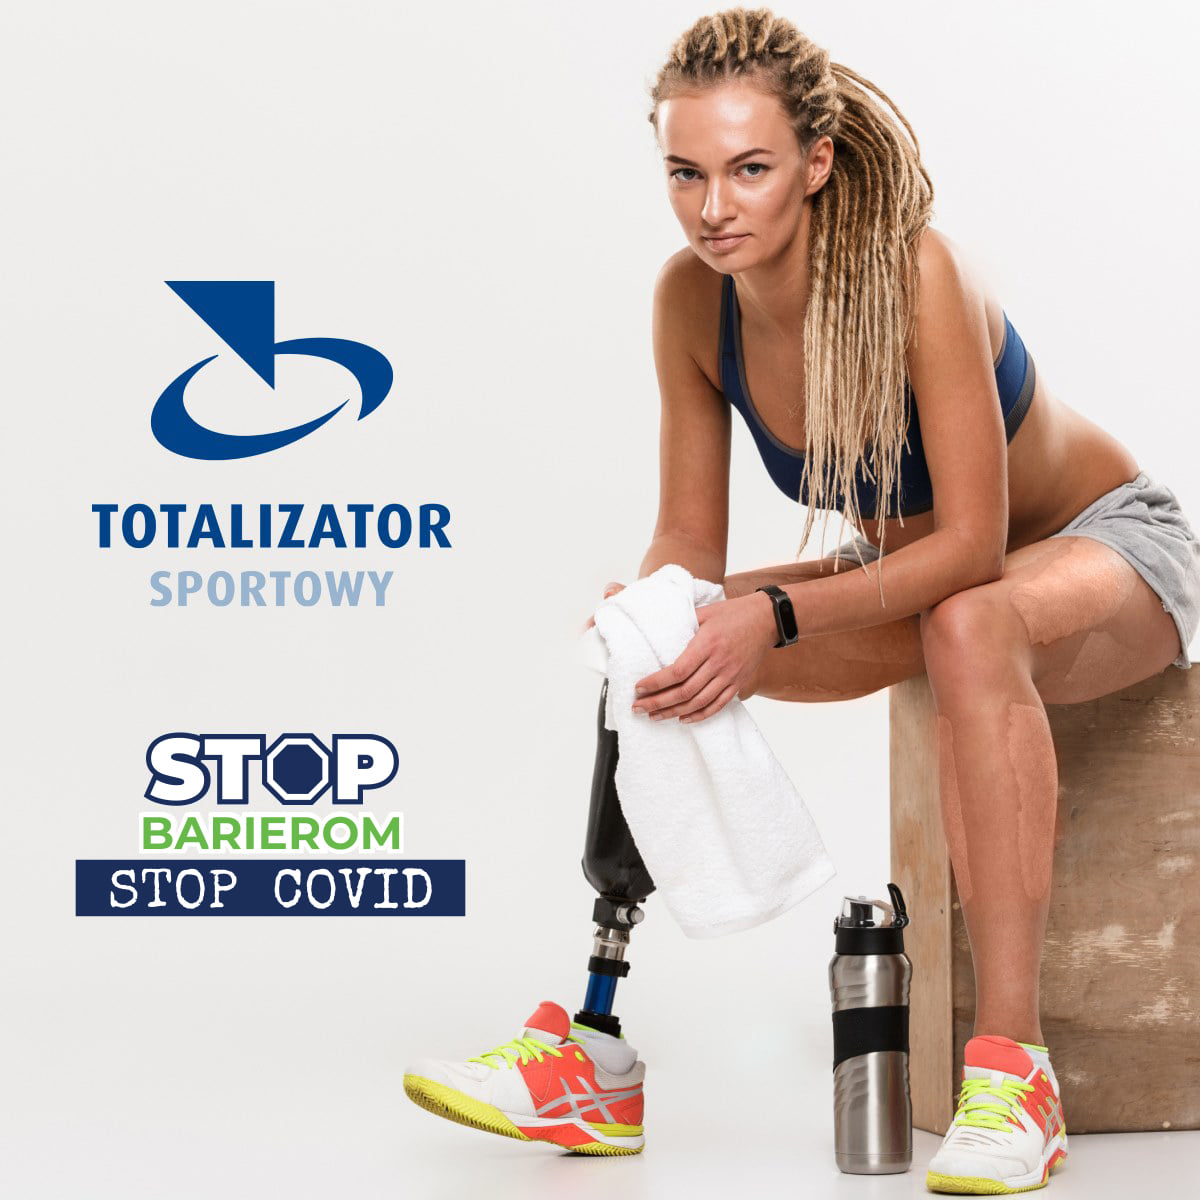 Kolektury Totatlizatora Sportowego Bez Barier!